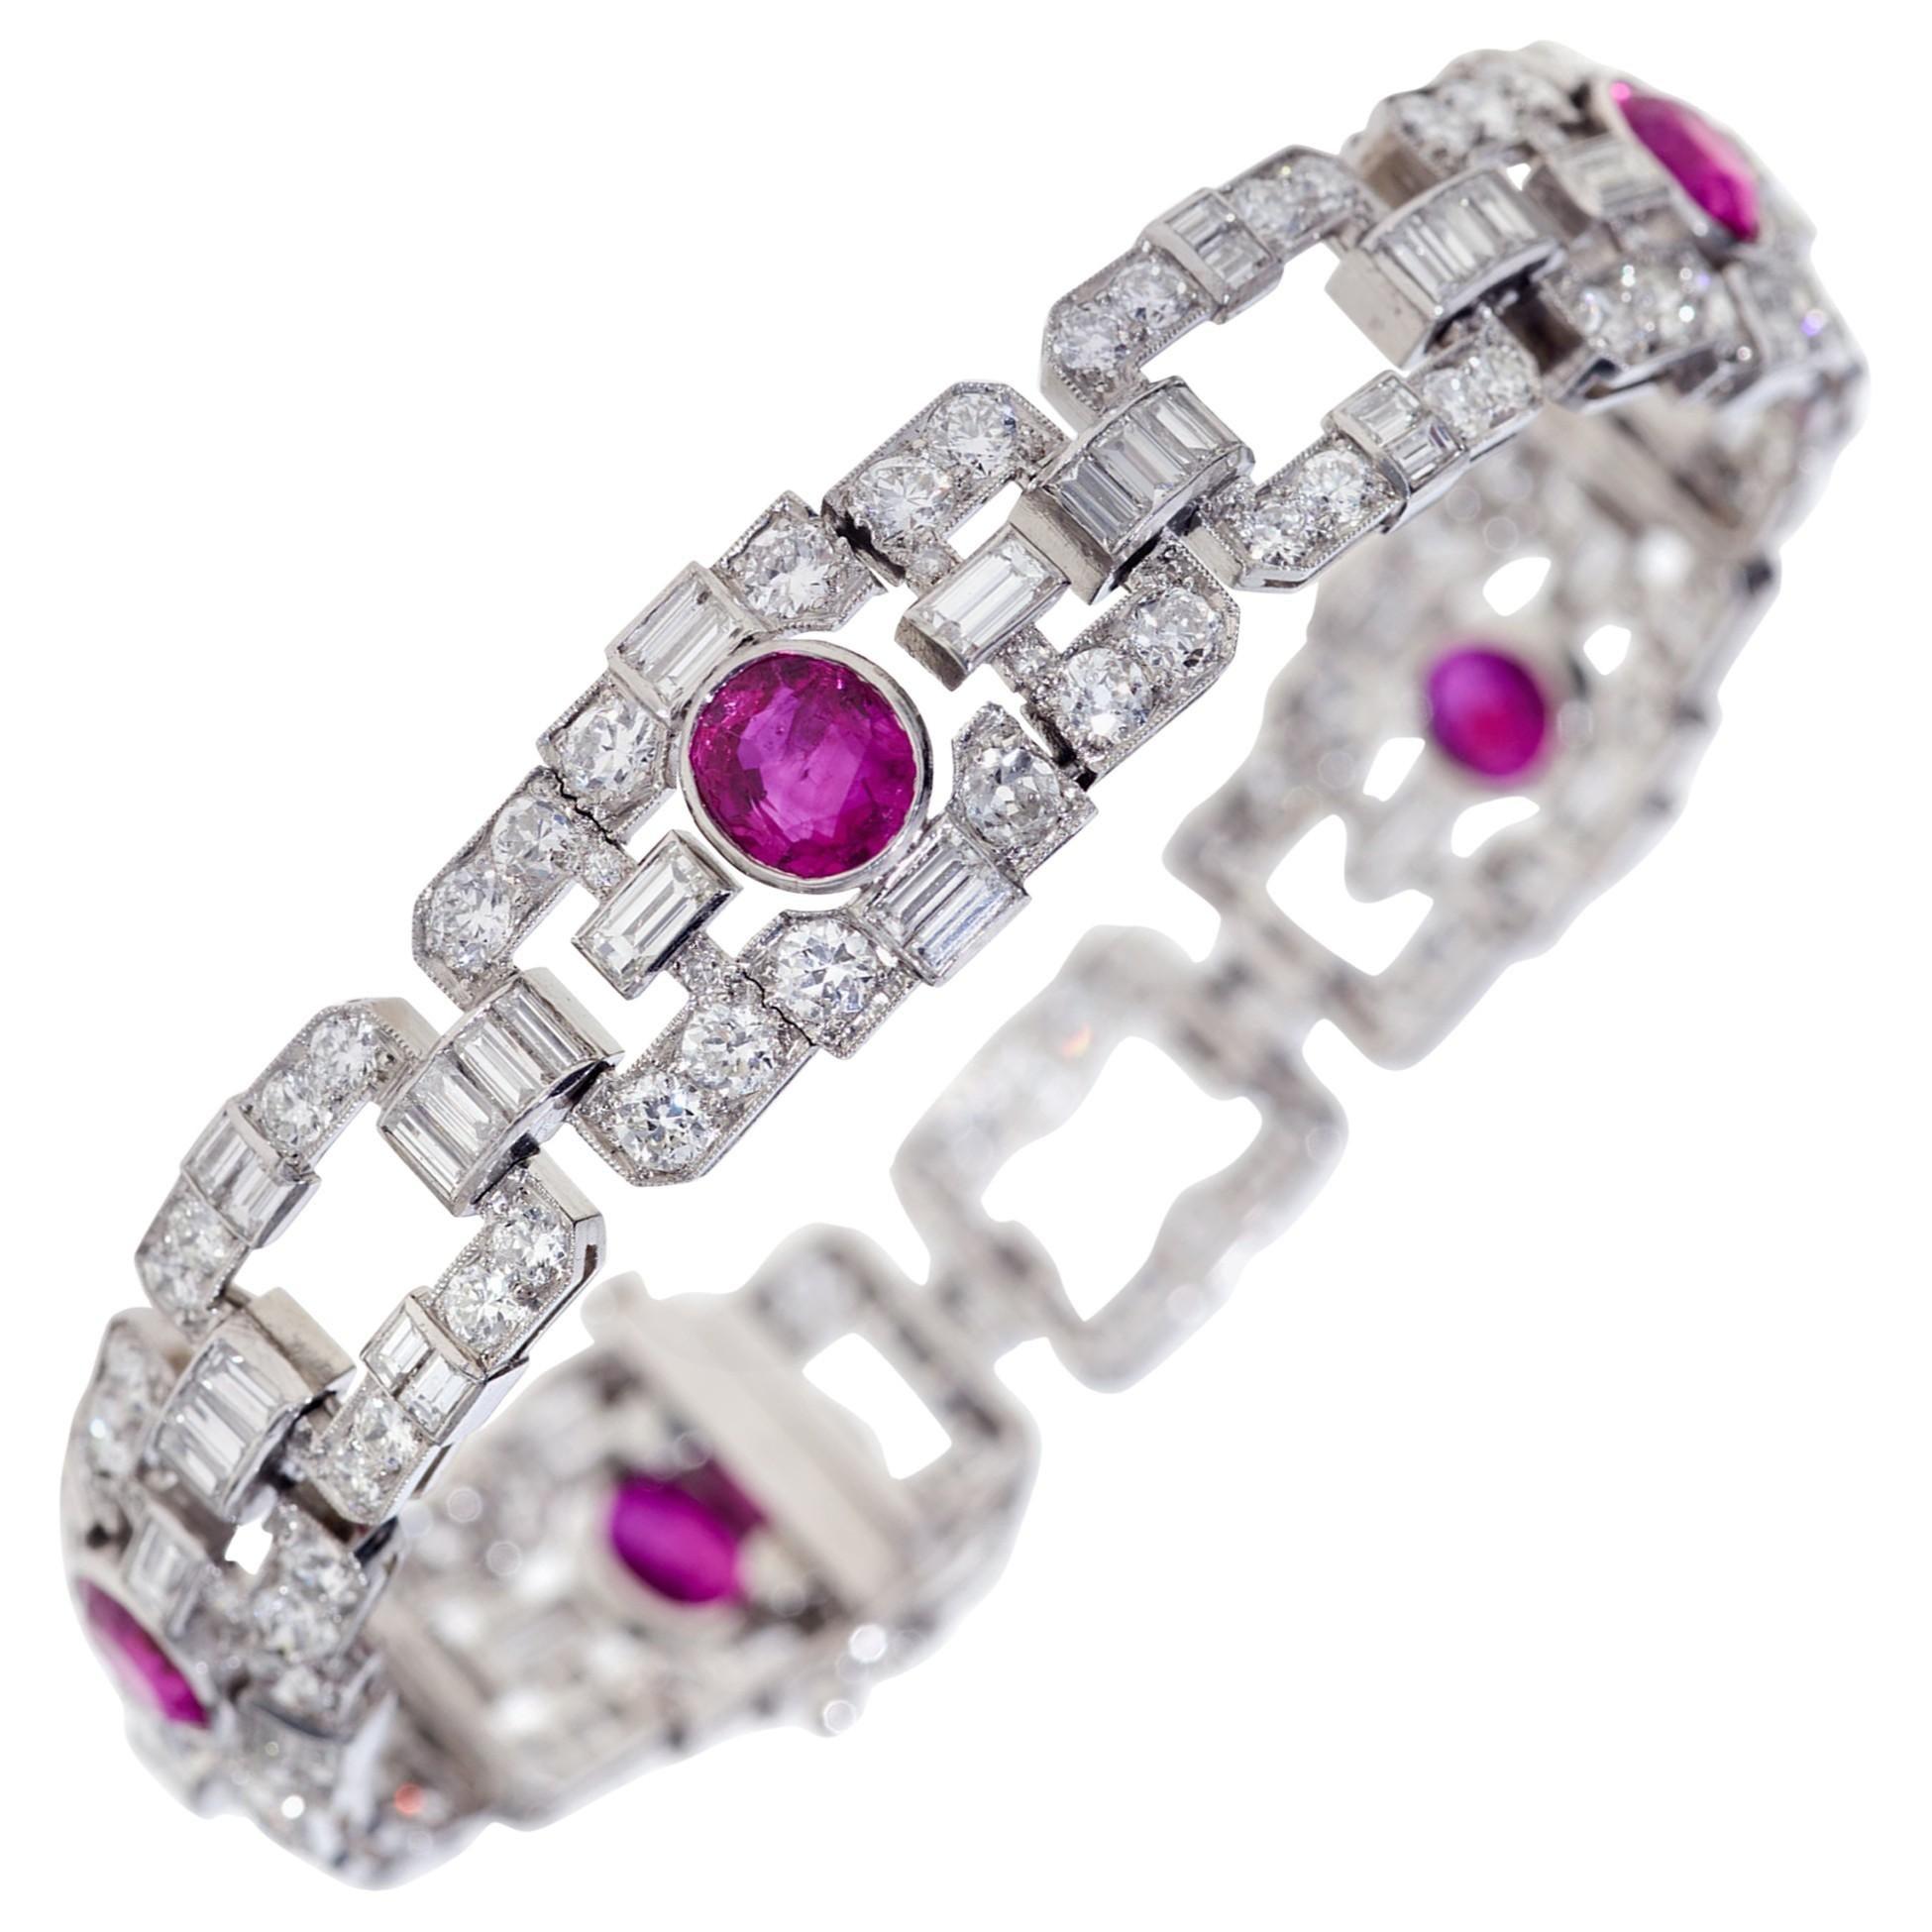 GIA Certified 11.07 Carat No Heat Burmese Ruby and Diamond Bracelet in Platinum